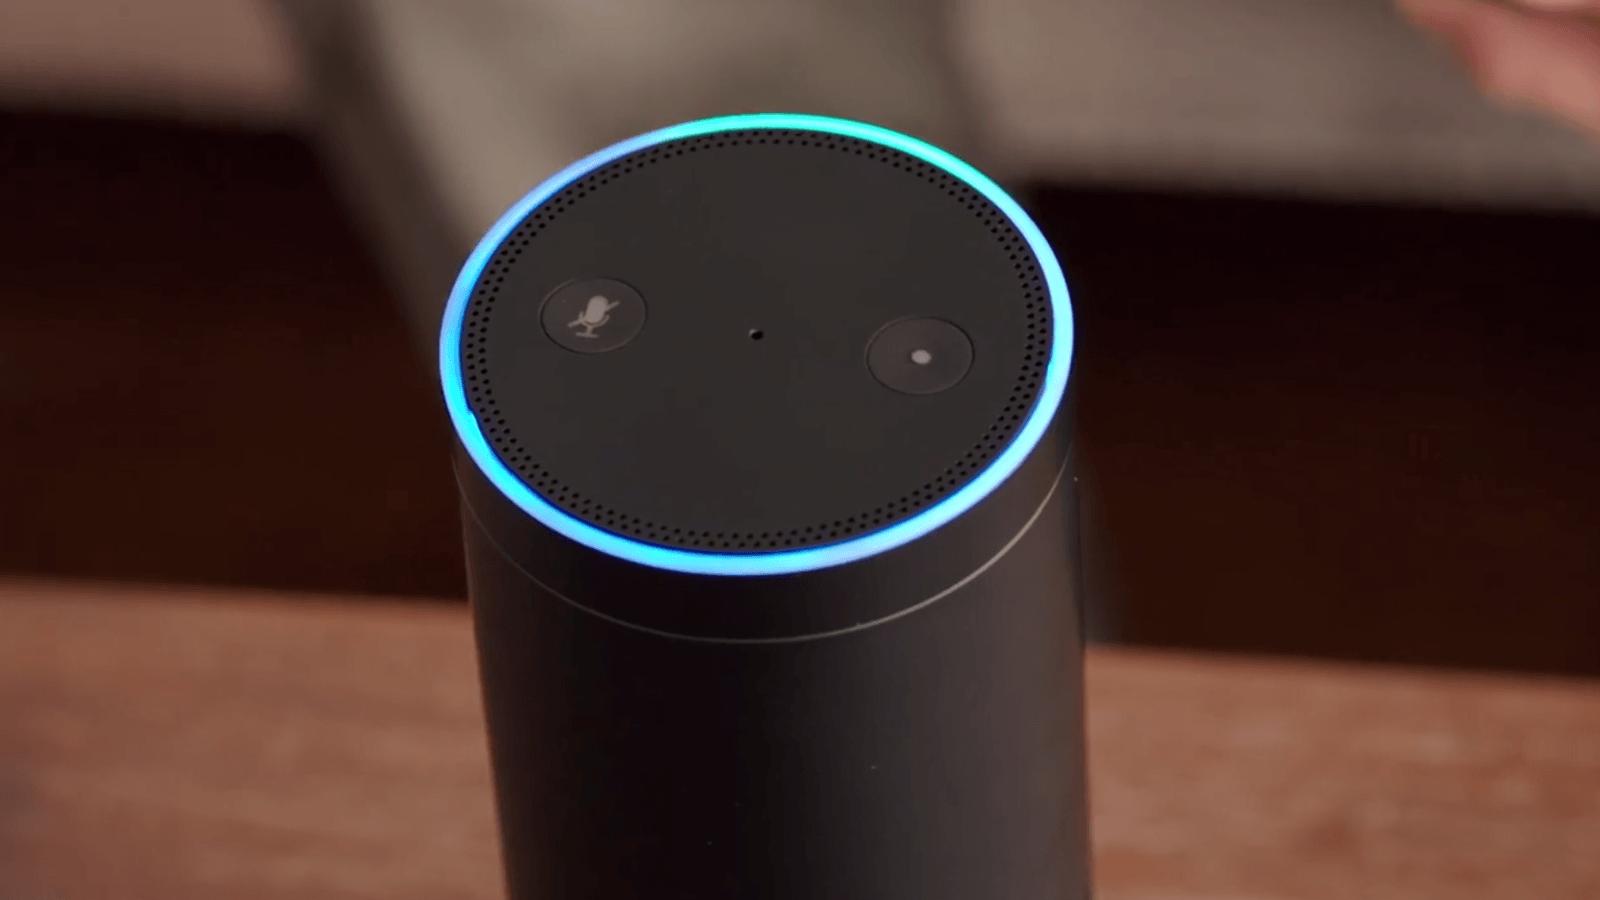 Siri Vs Alexa Best Skills And Compatibility Comparison